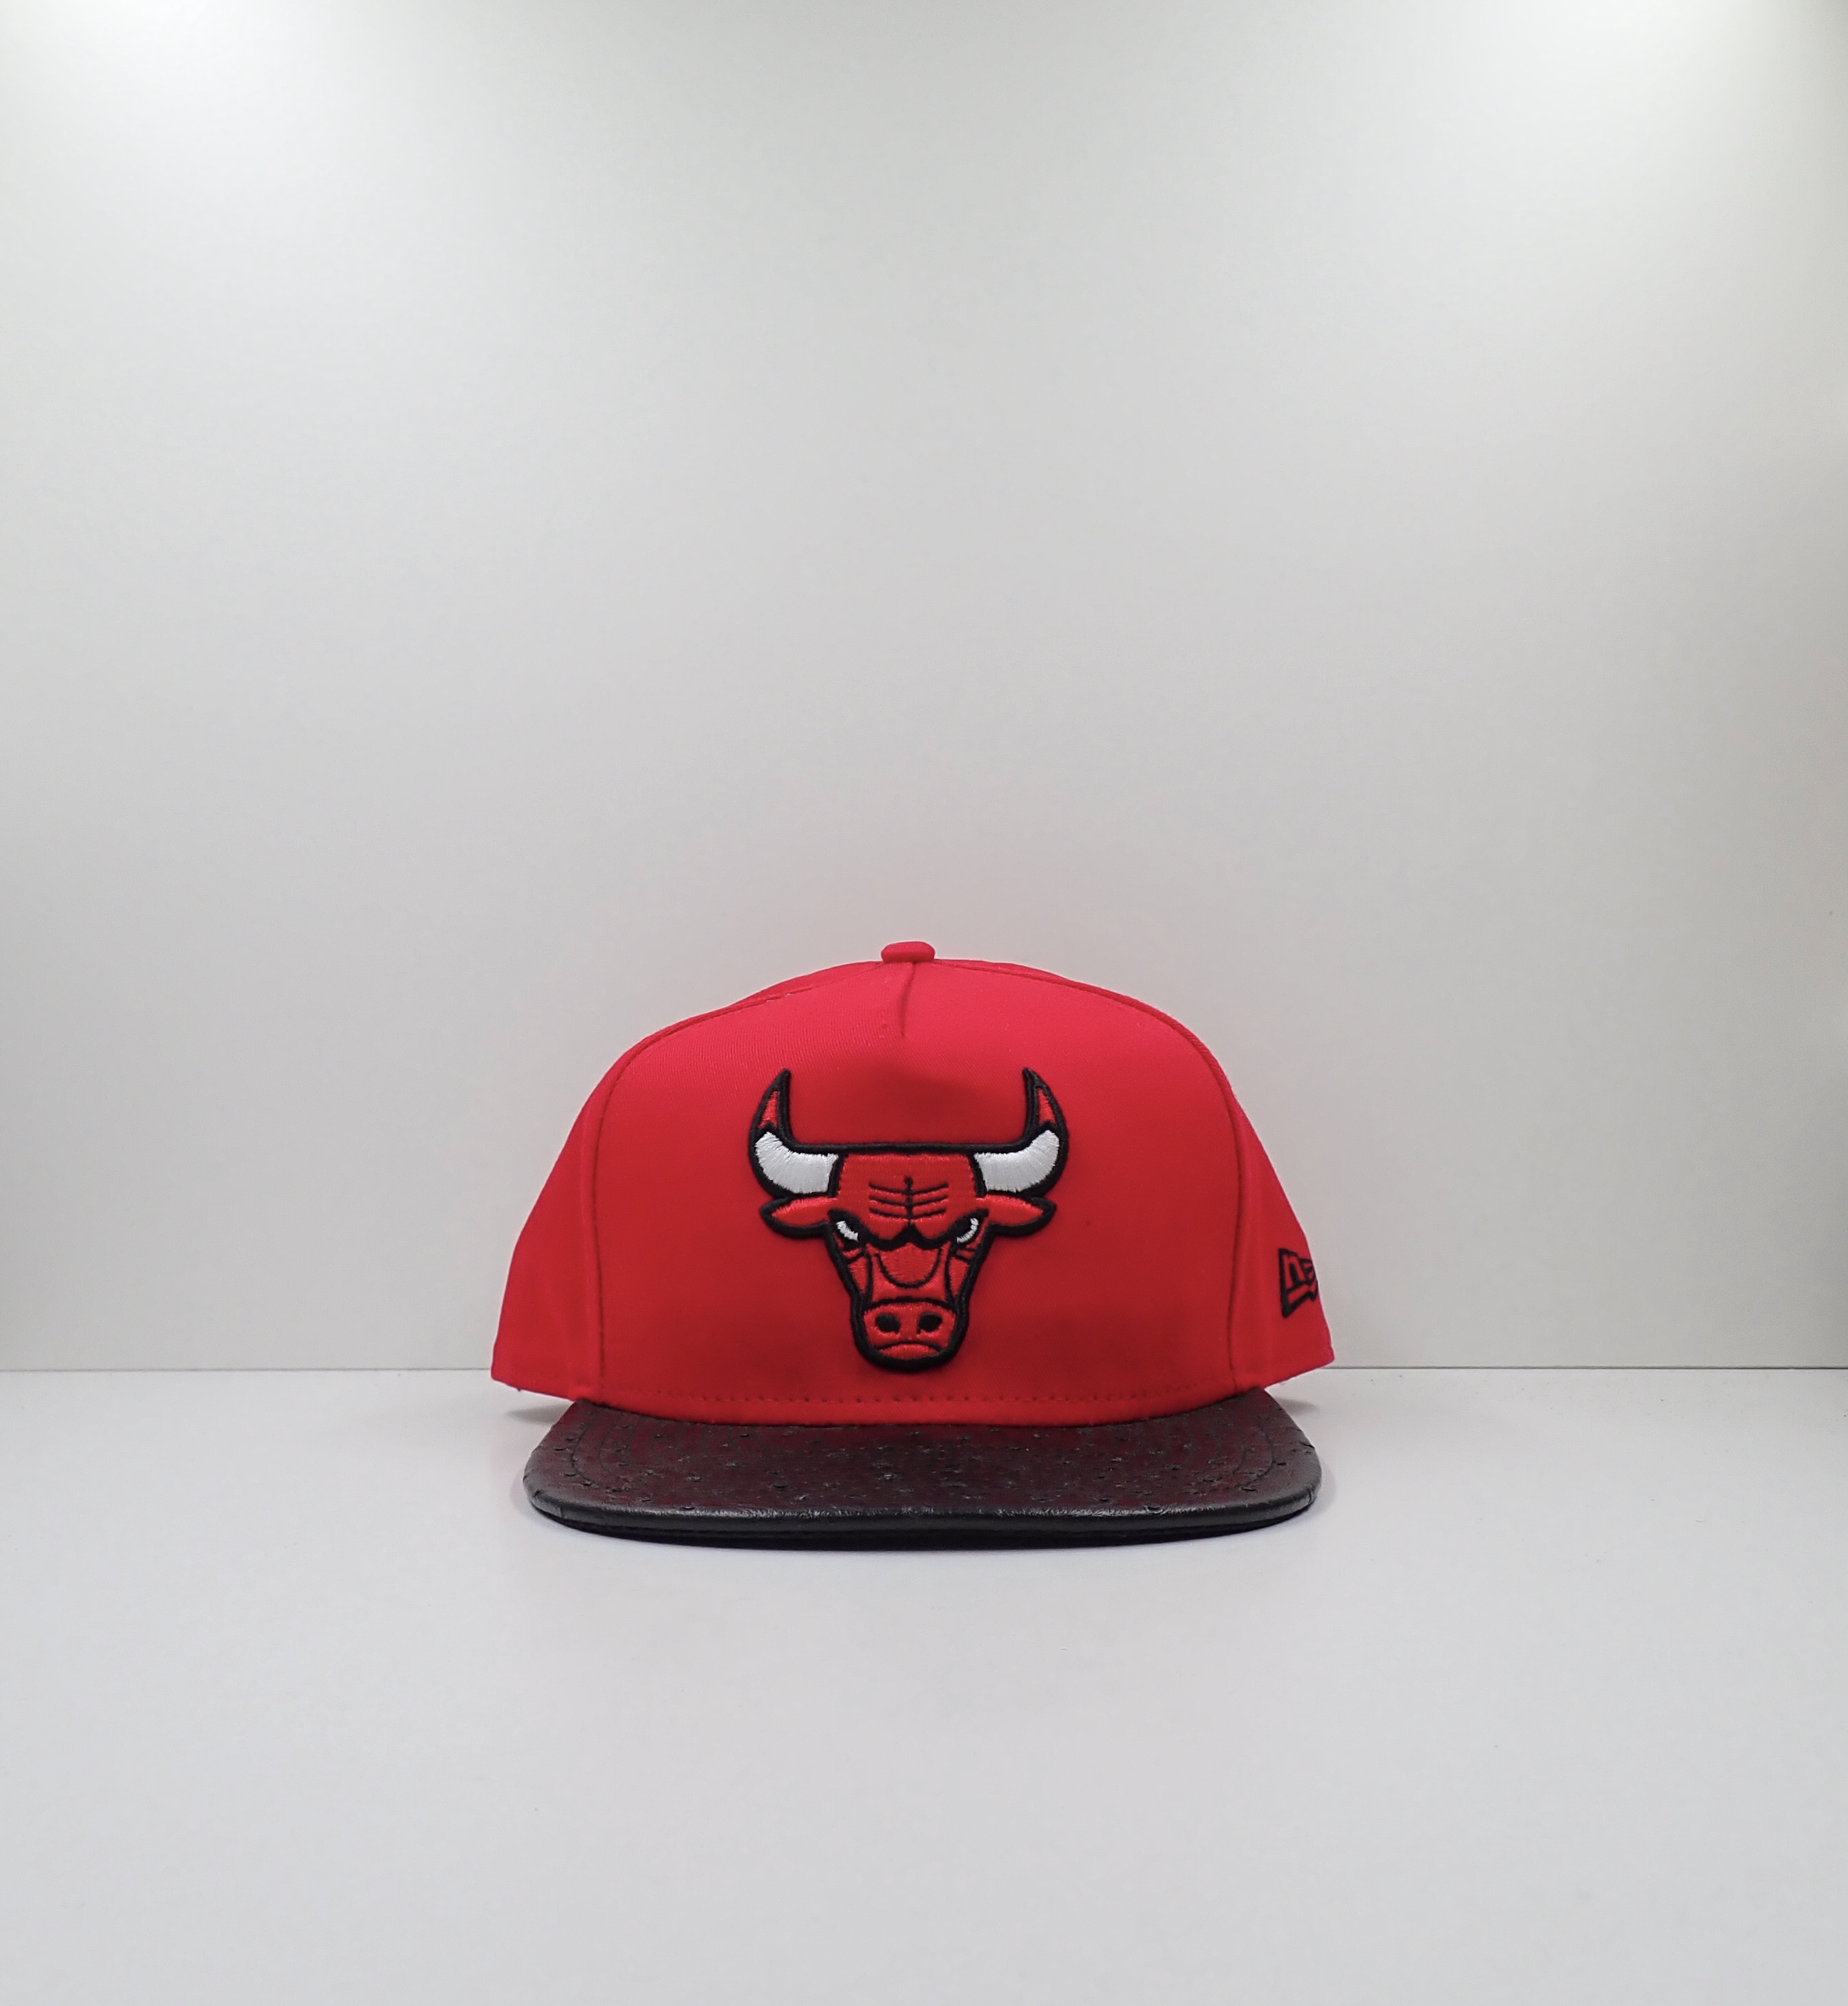 New Era Chicago Bulls Red Snapback Cap